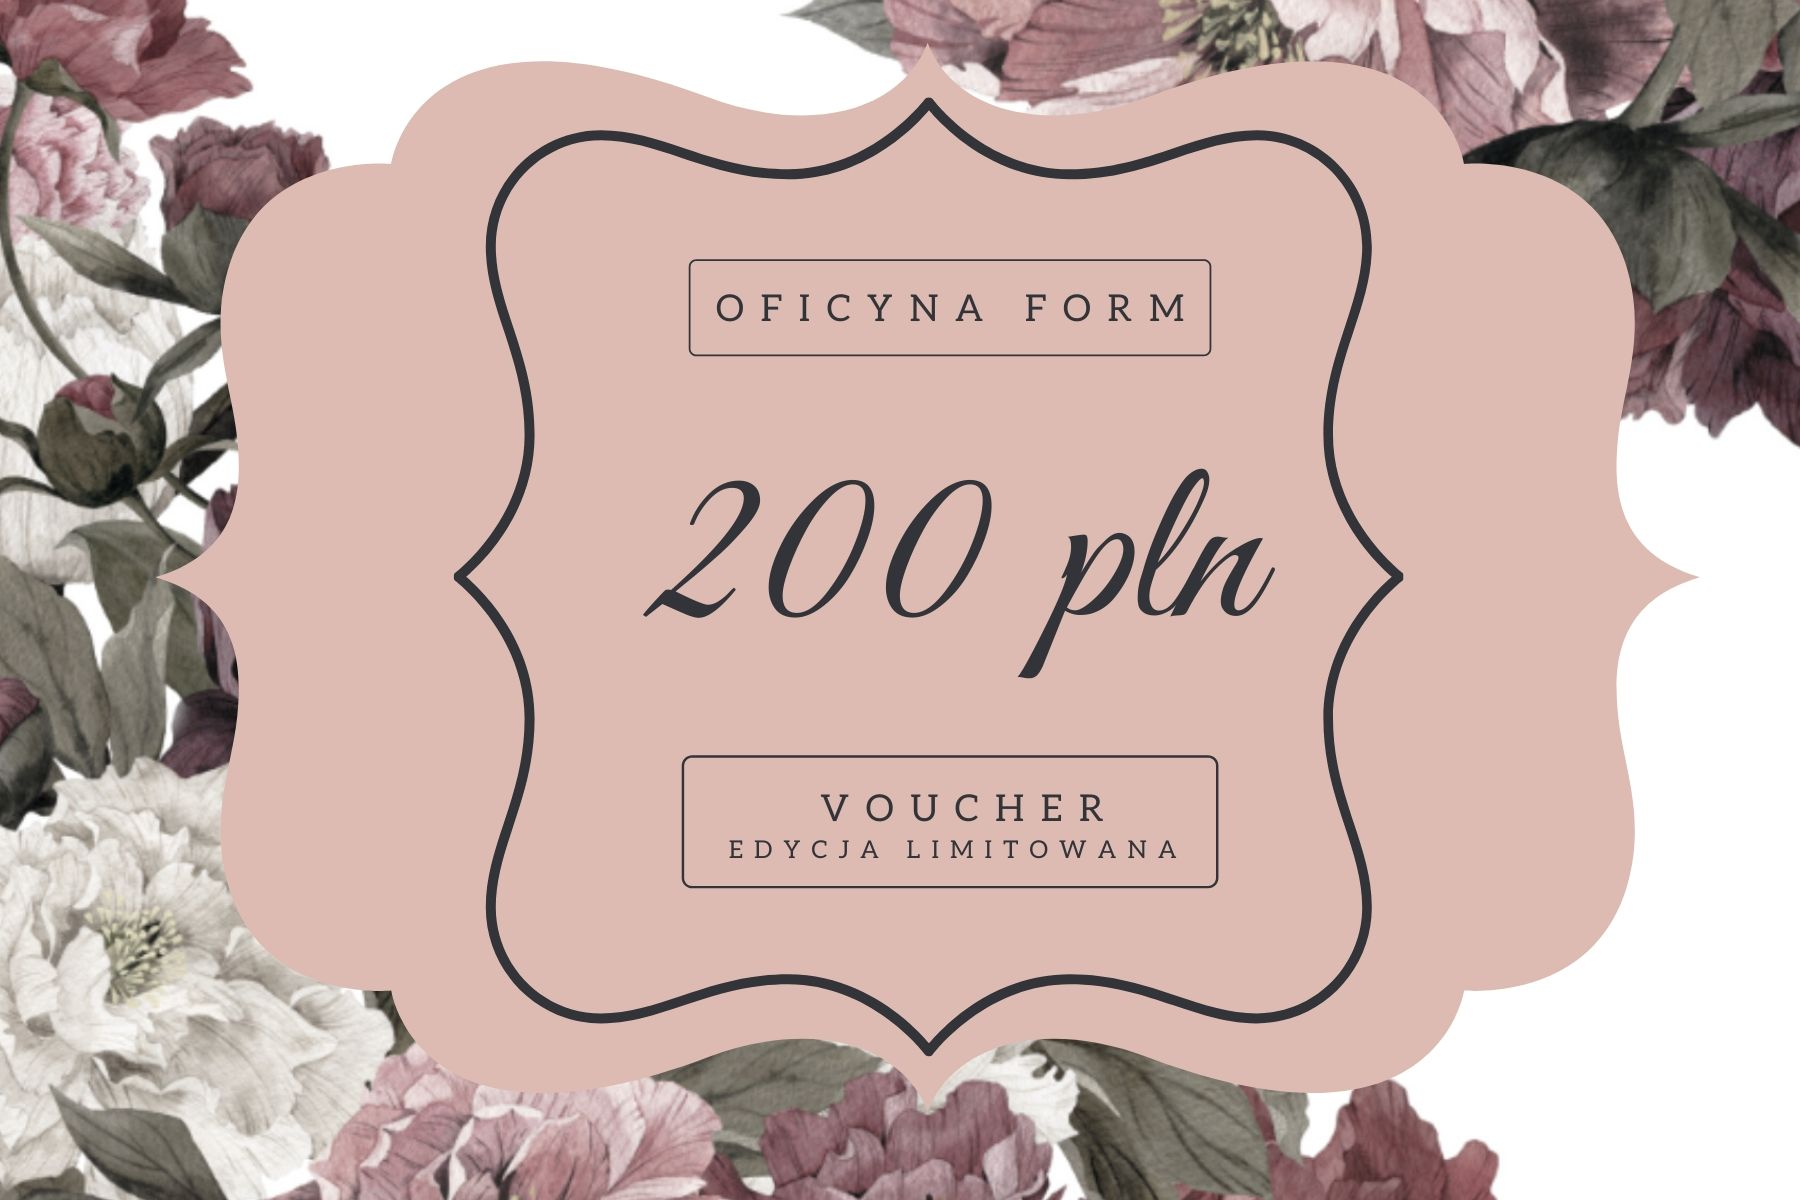 voucher 200 pln Oficyna Form